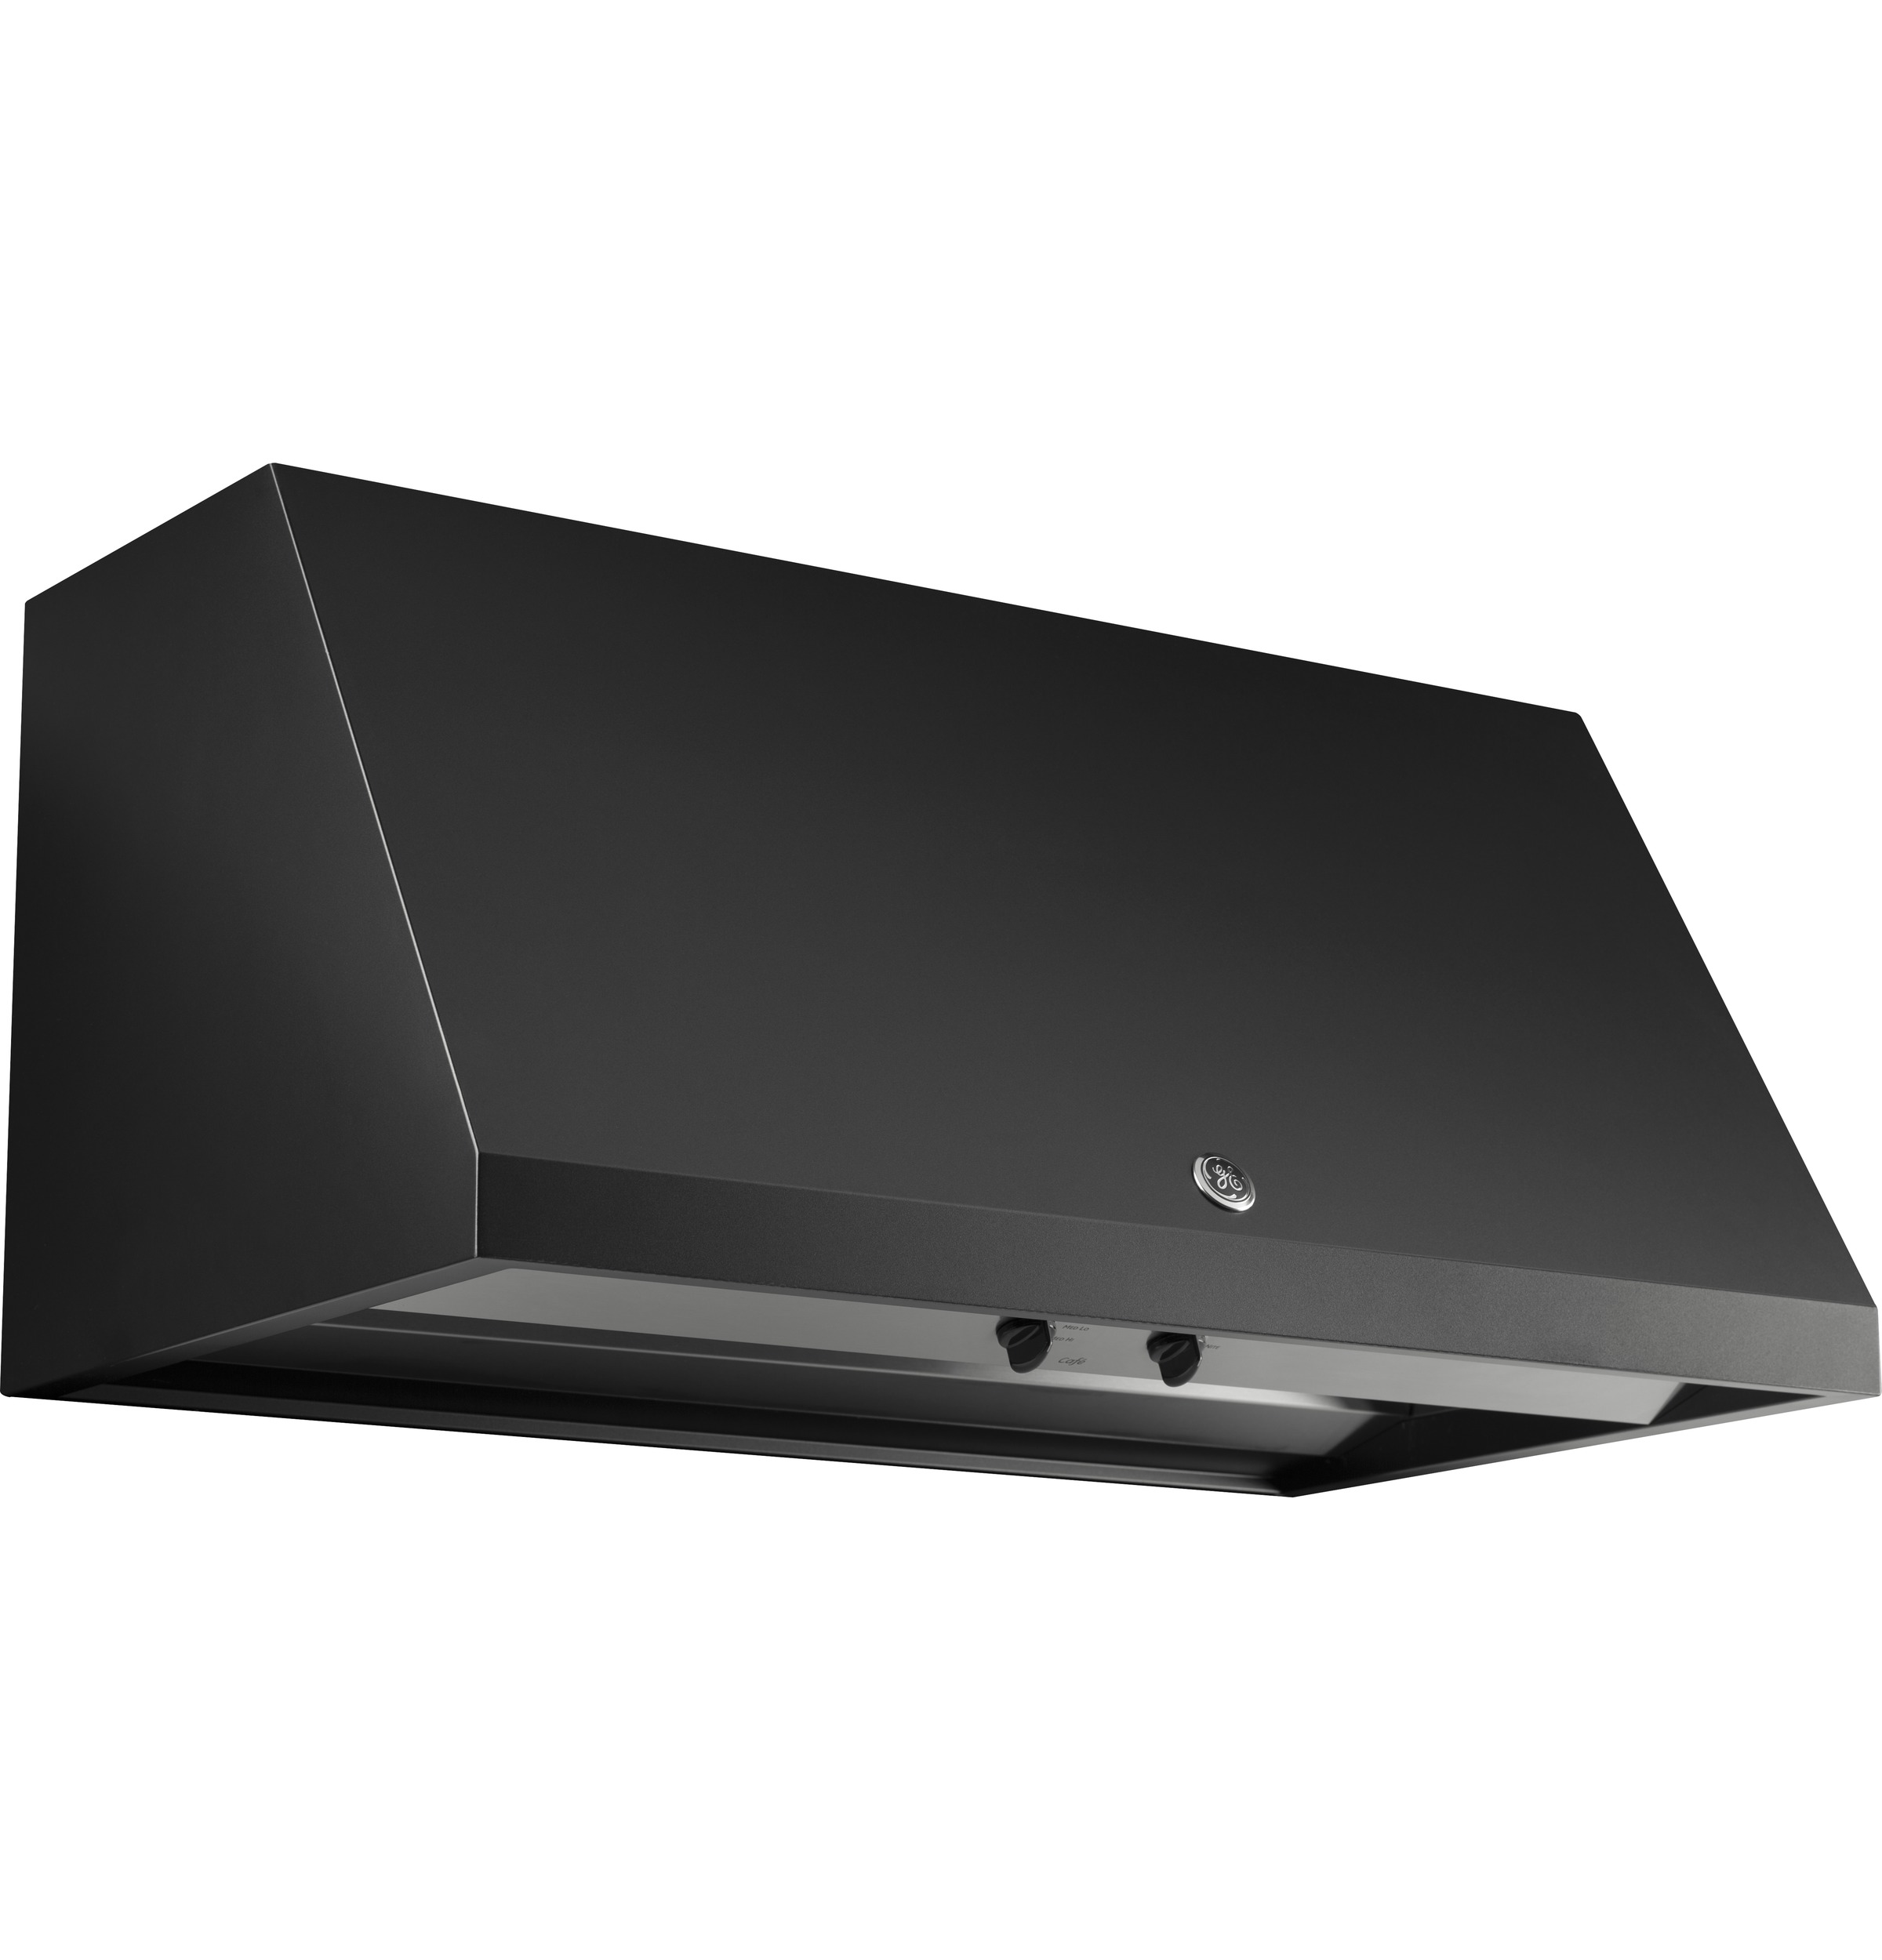 Model: CV966EKDS | GE Café™ Series 36